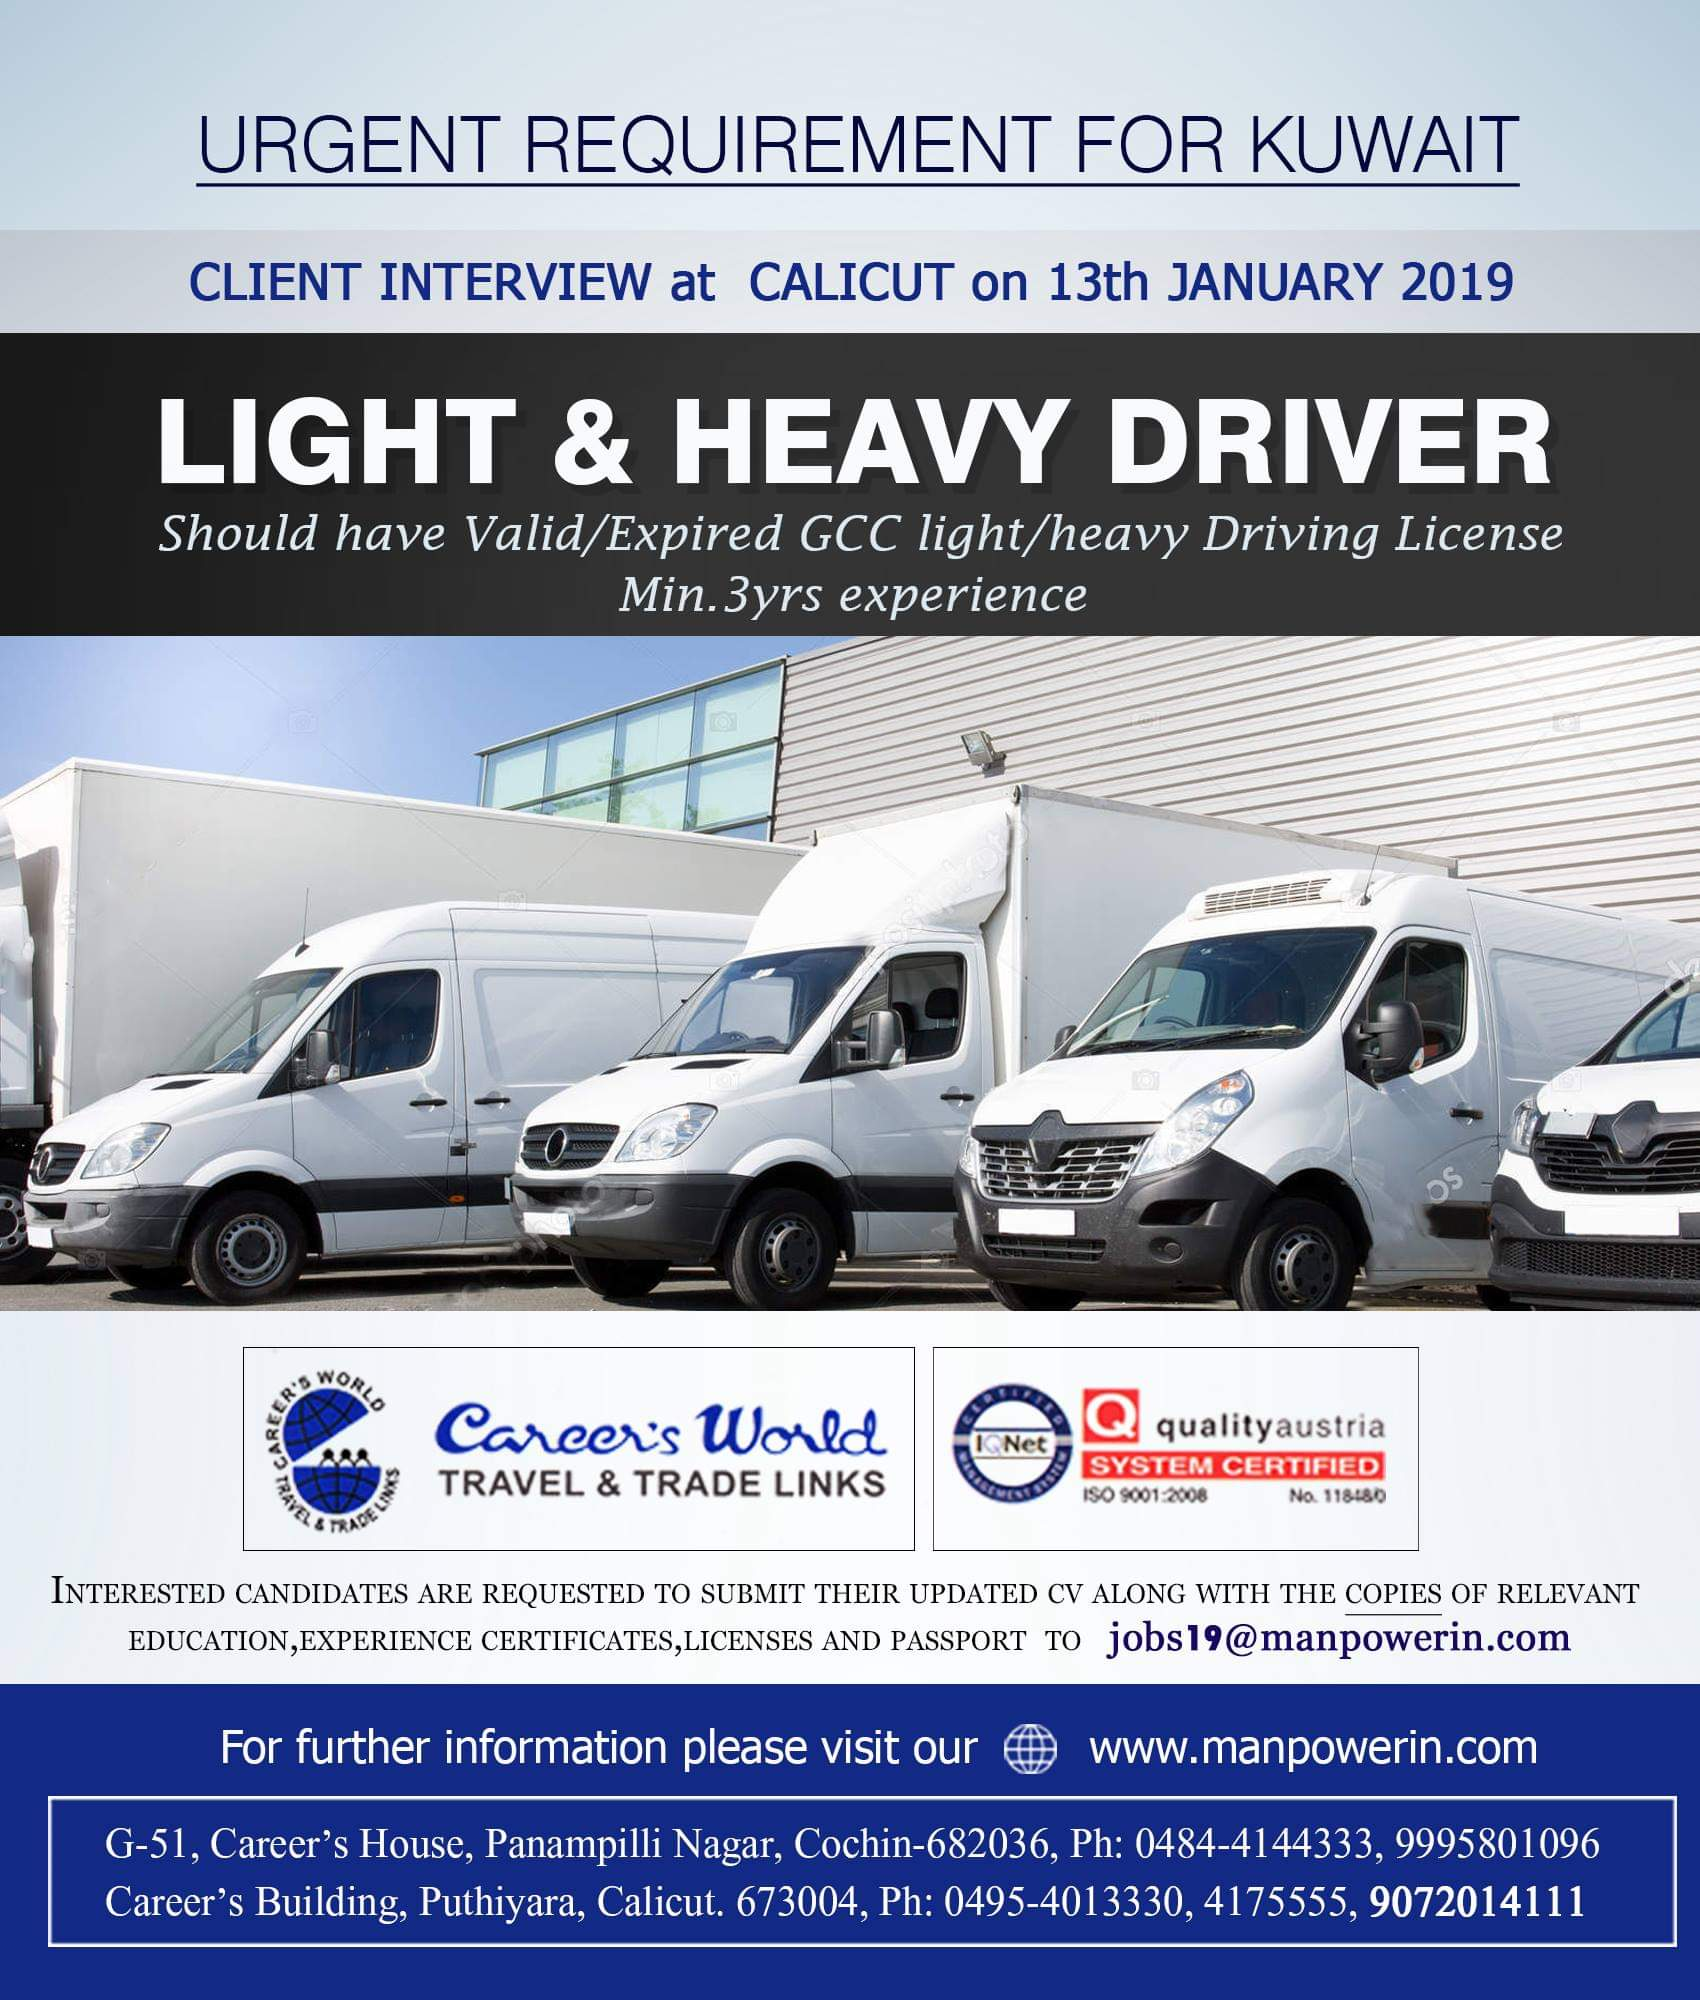 URGENT Requirement for KUWAIT- Light & Heavy Driver